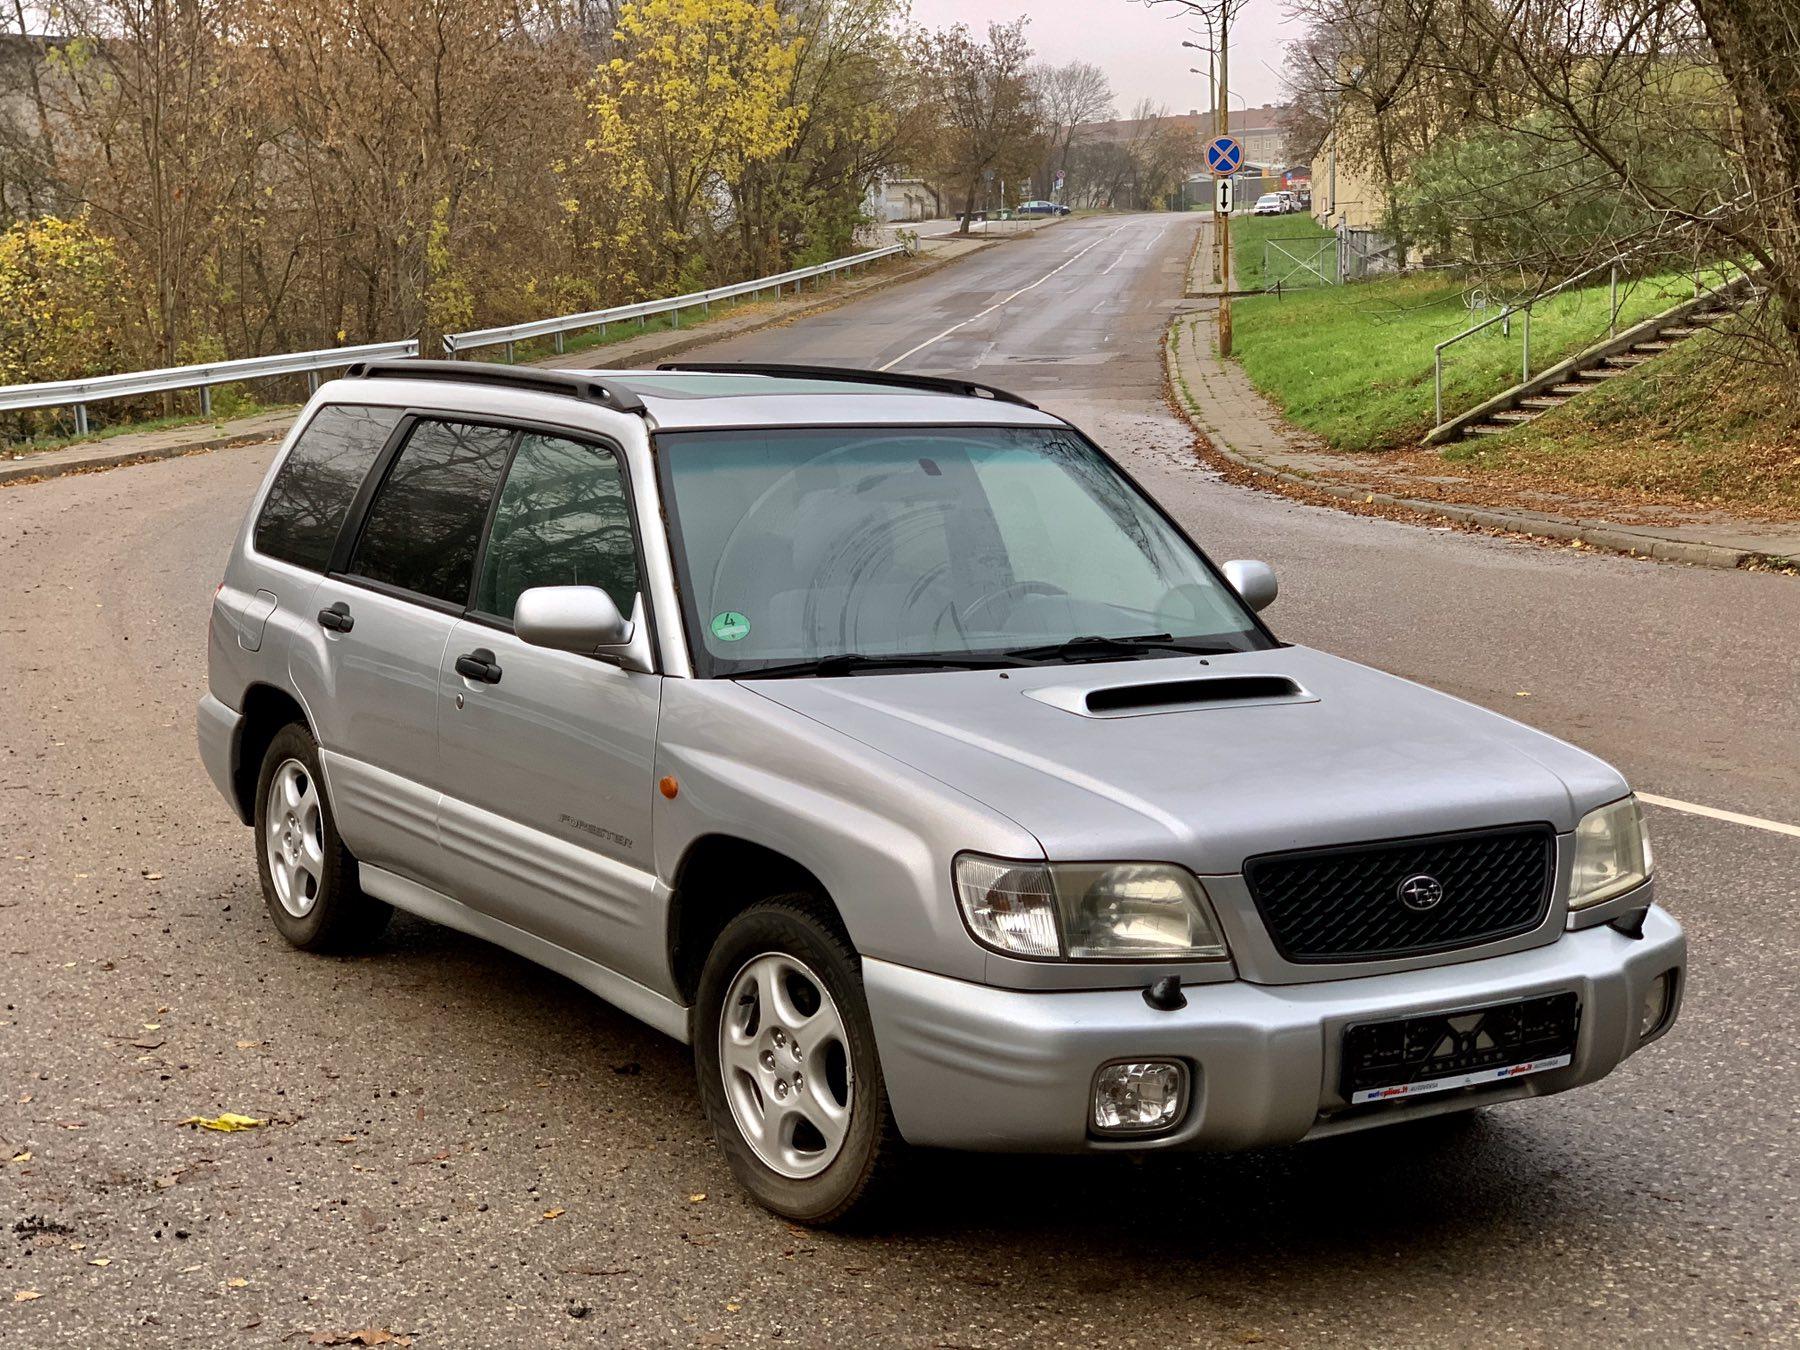 Subaru Forester, 2.0 l., universalas